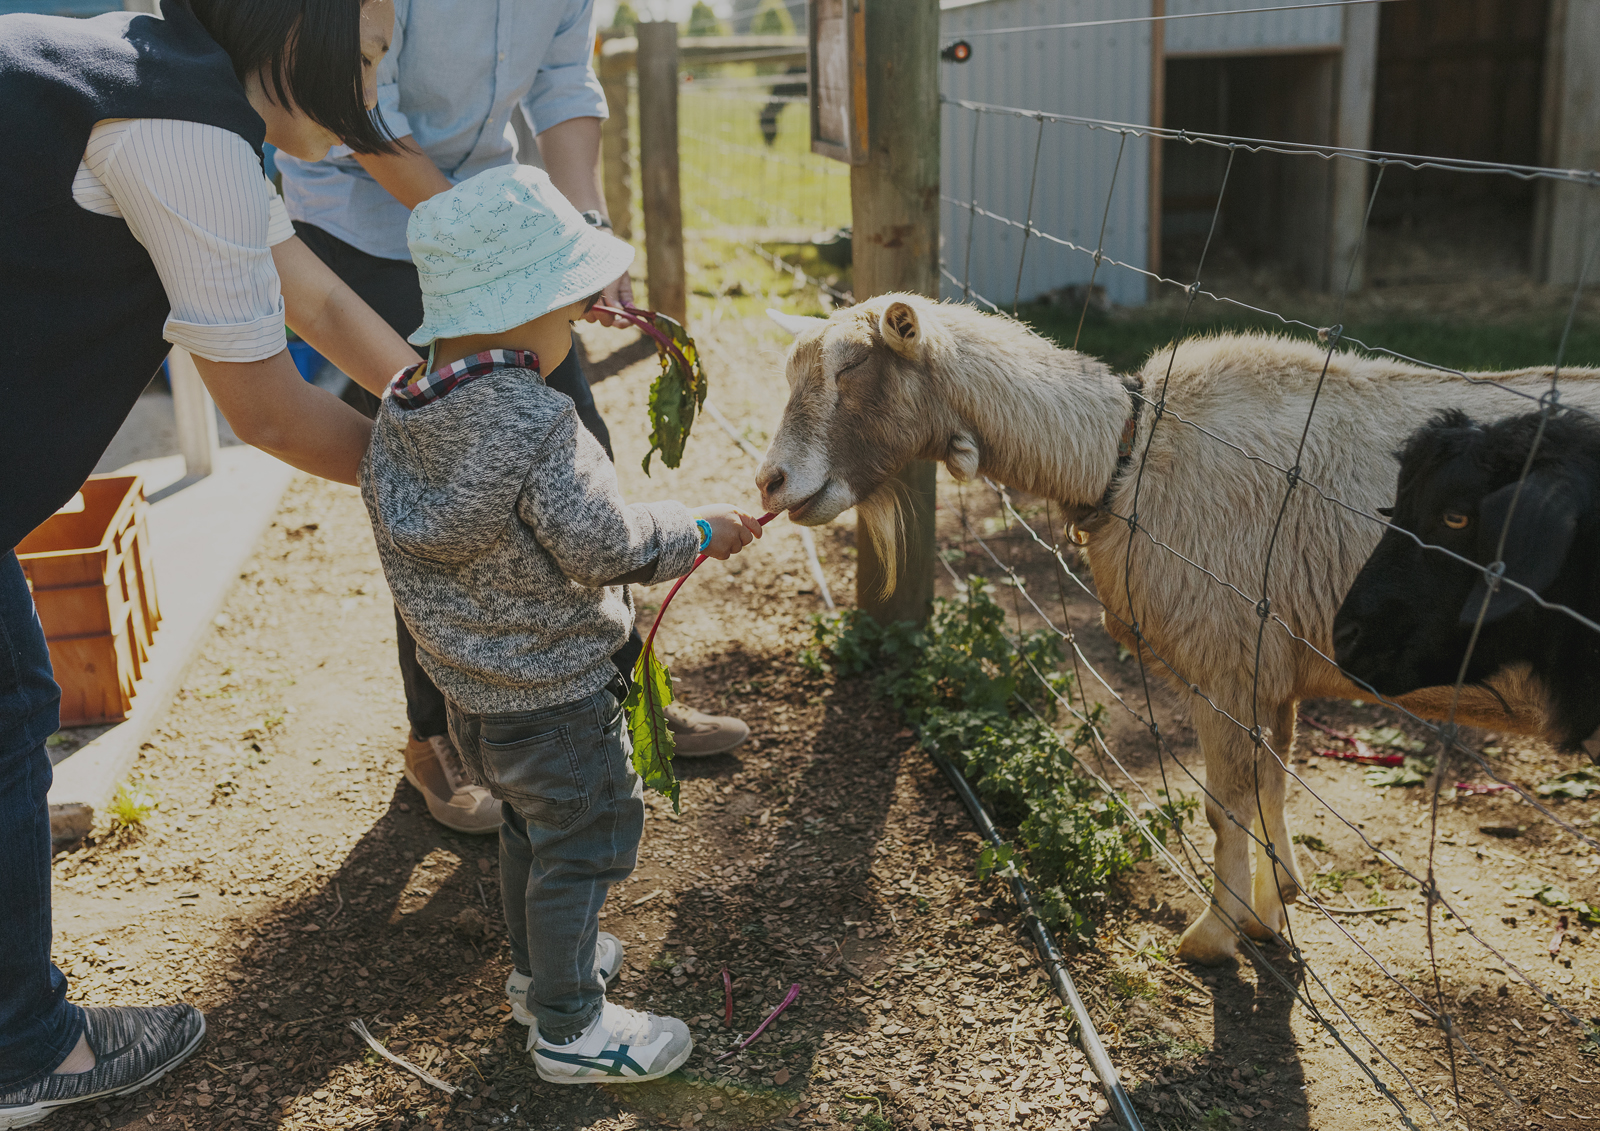 Feeding the goats at Benton Rise Farm